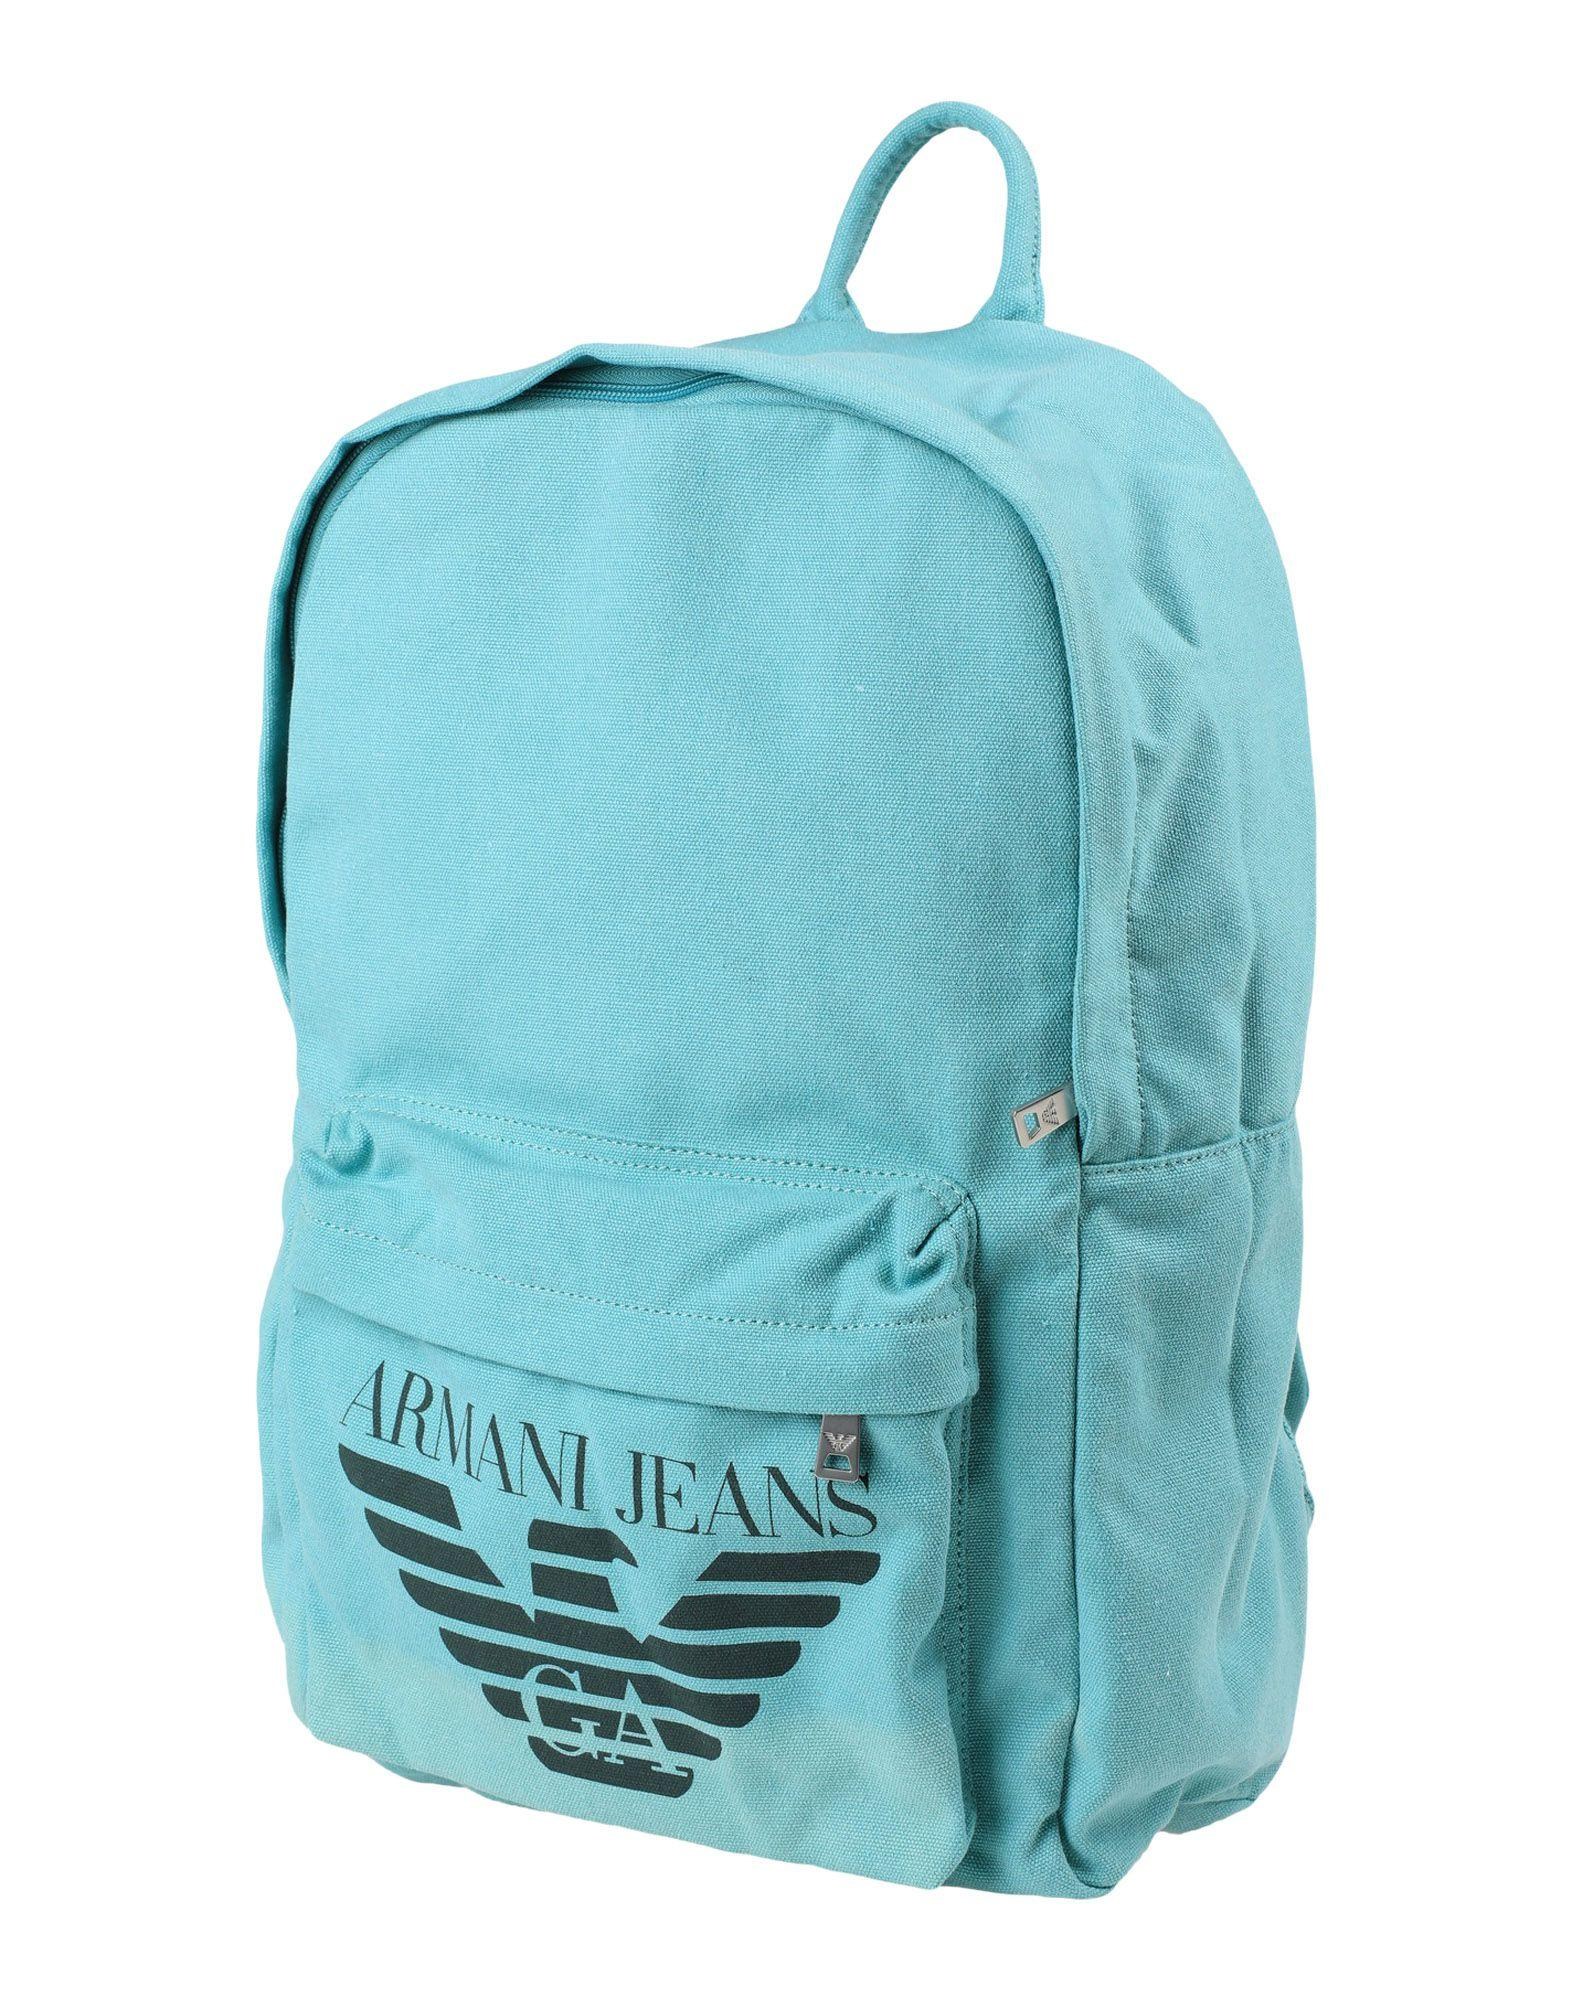 Armani Jeans Backpacks & Fanny Packs In Light Green